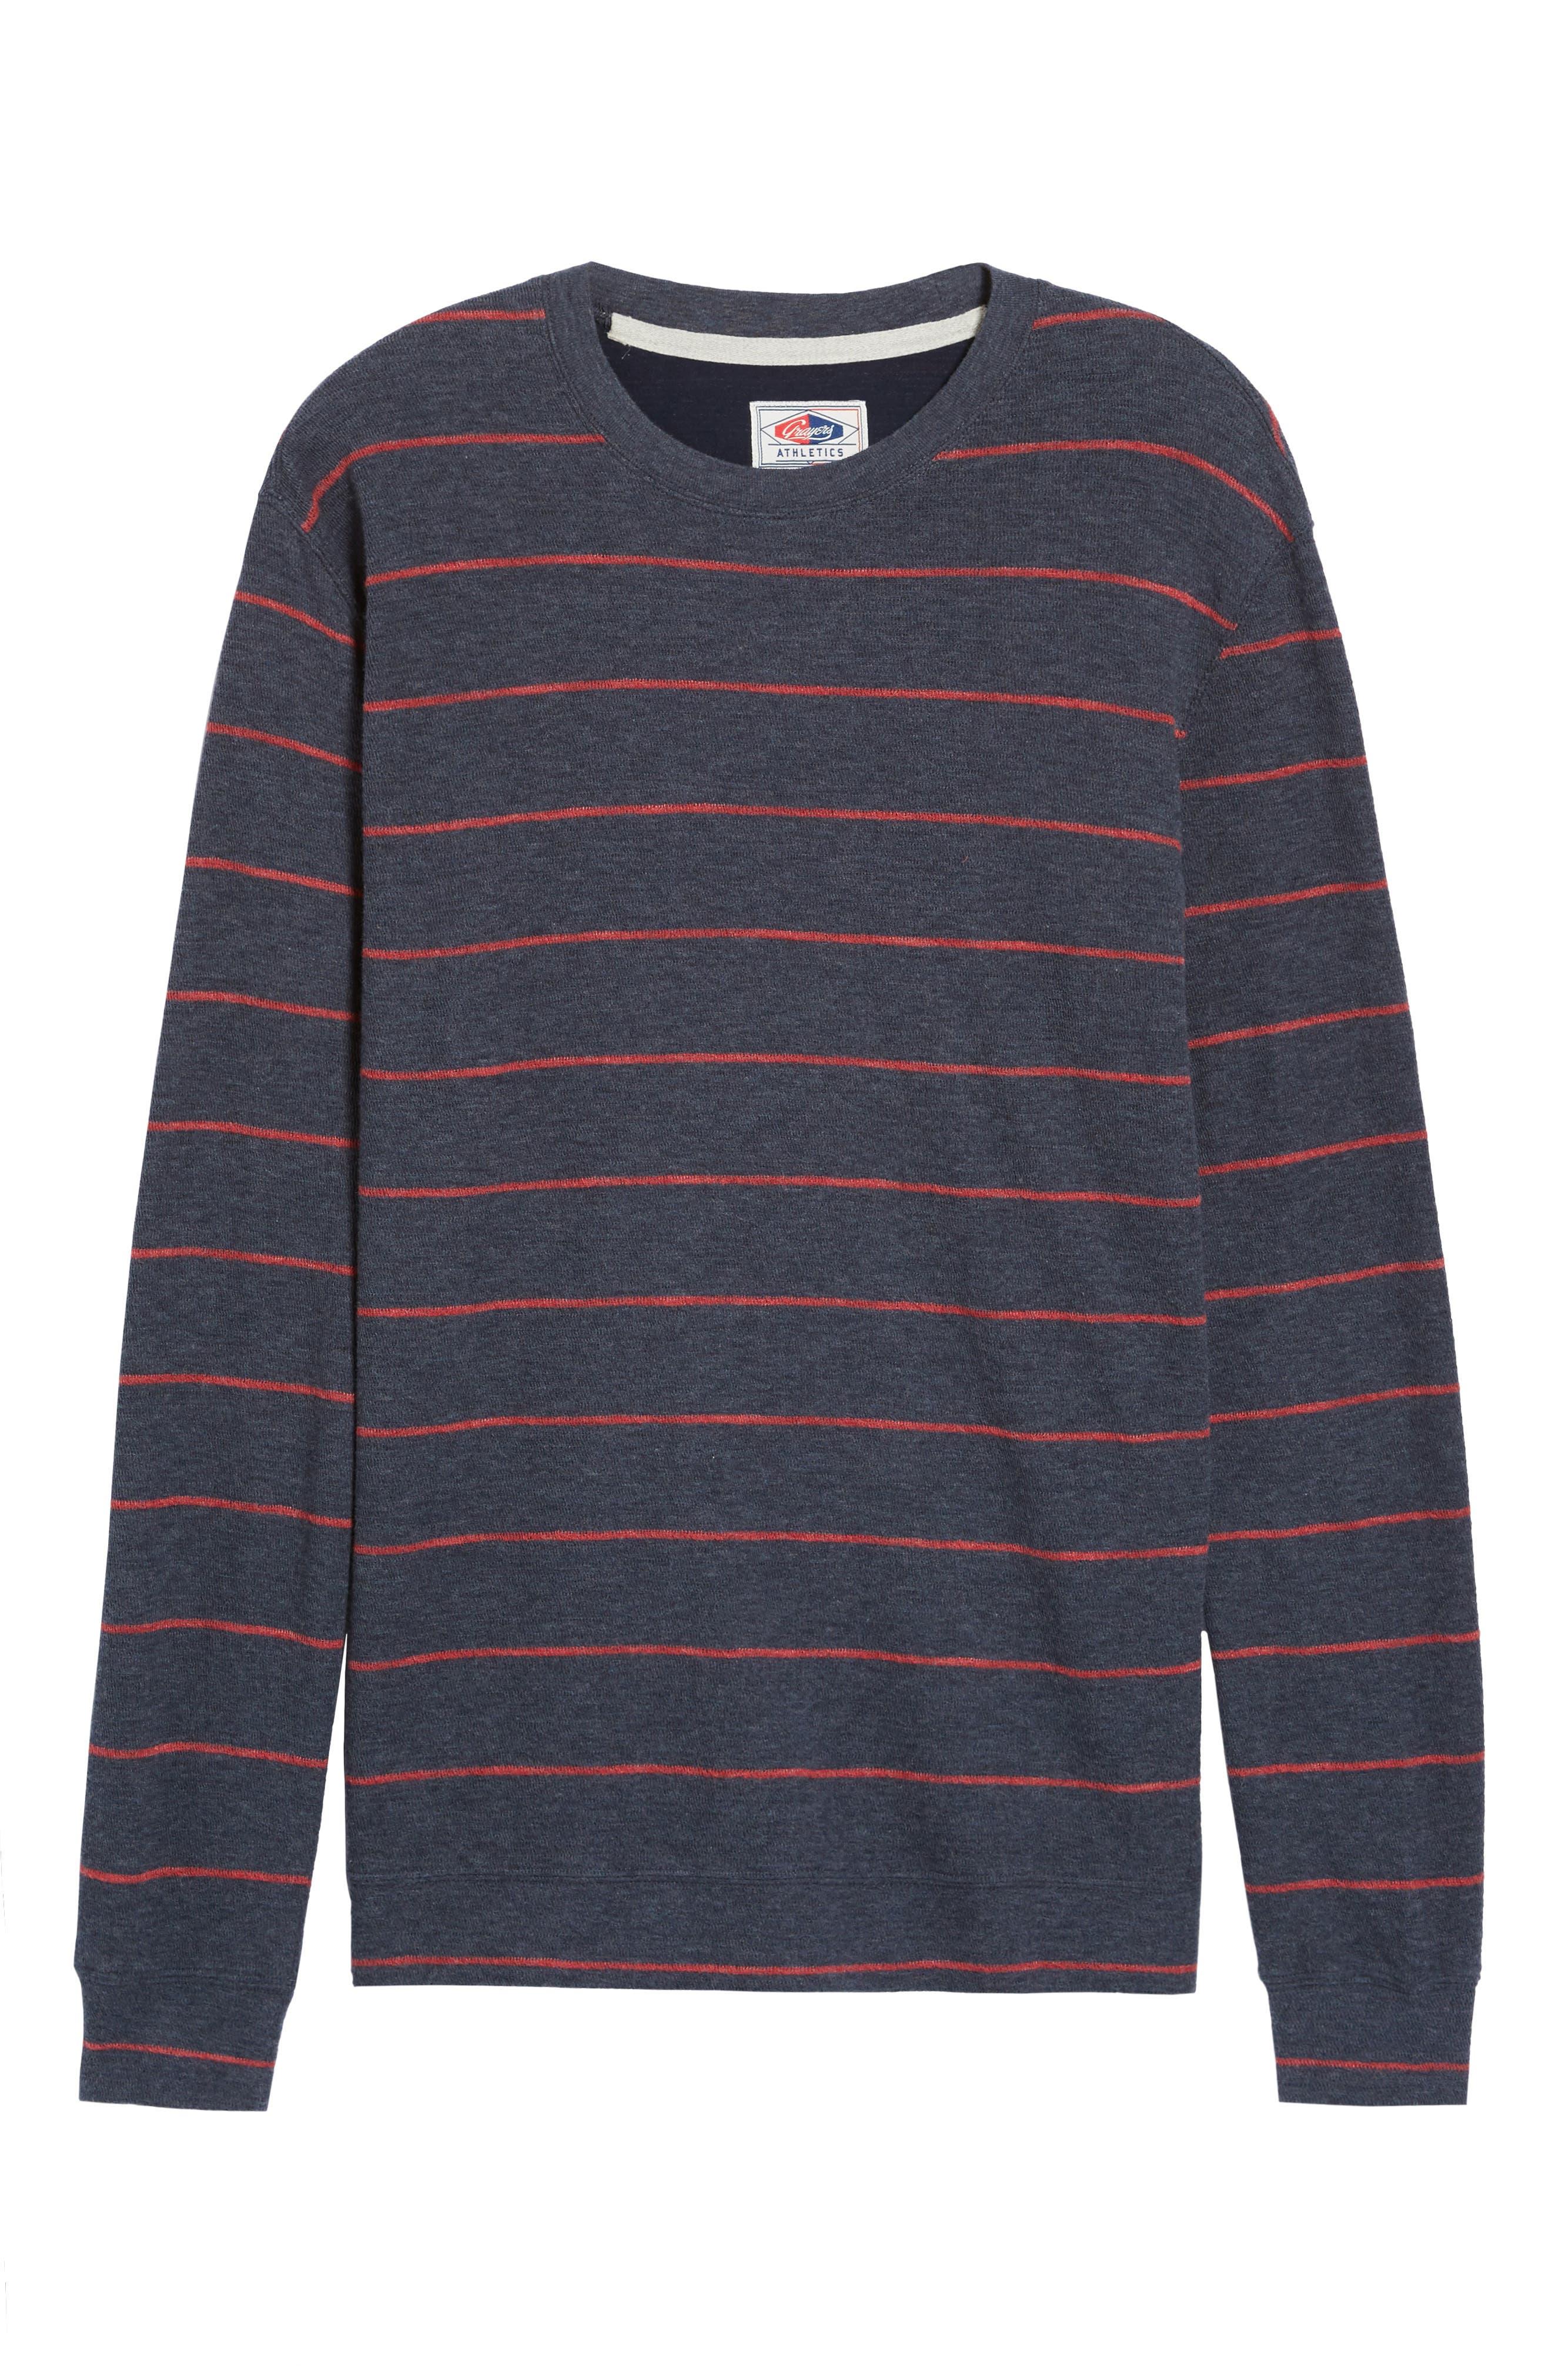 Baird Stripe Crewneck Sweatshirt,                             Alternate thumbnail 6, color,                             412